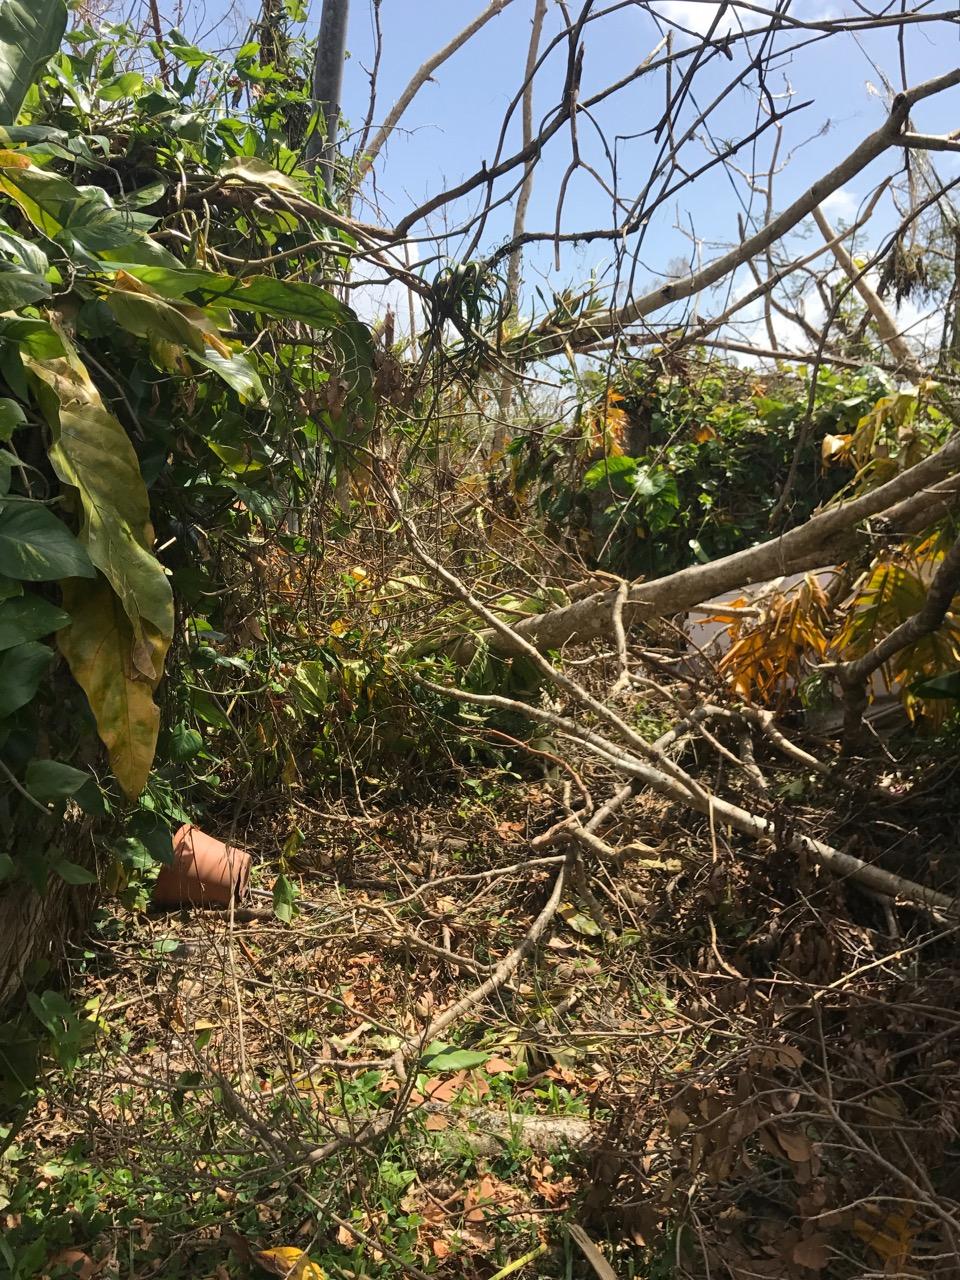 View from the Compost Studio, Aguas Buenas, Puerto Rico. November 2017 (post Maria)